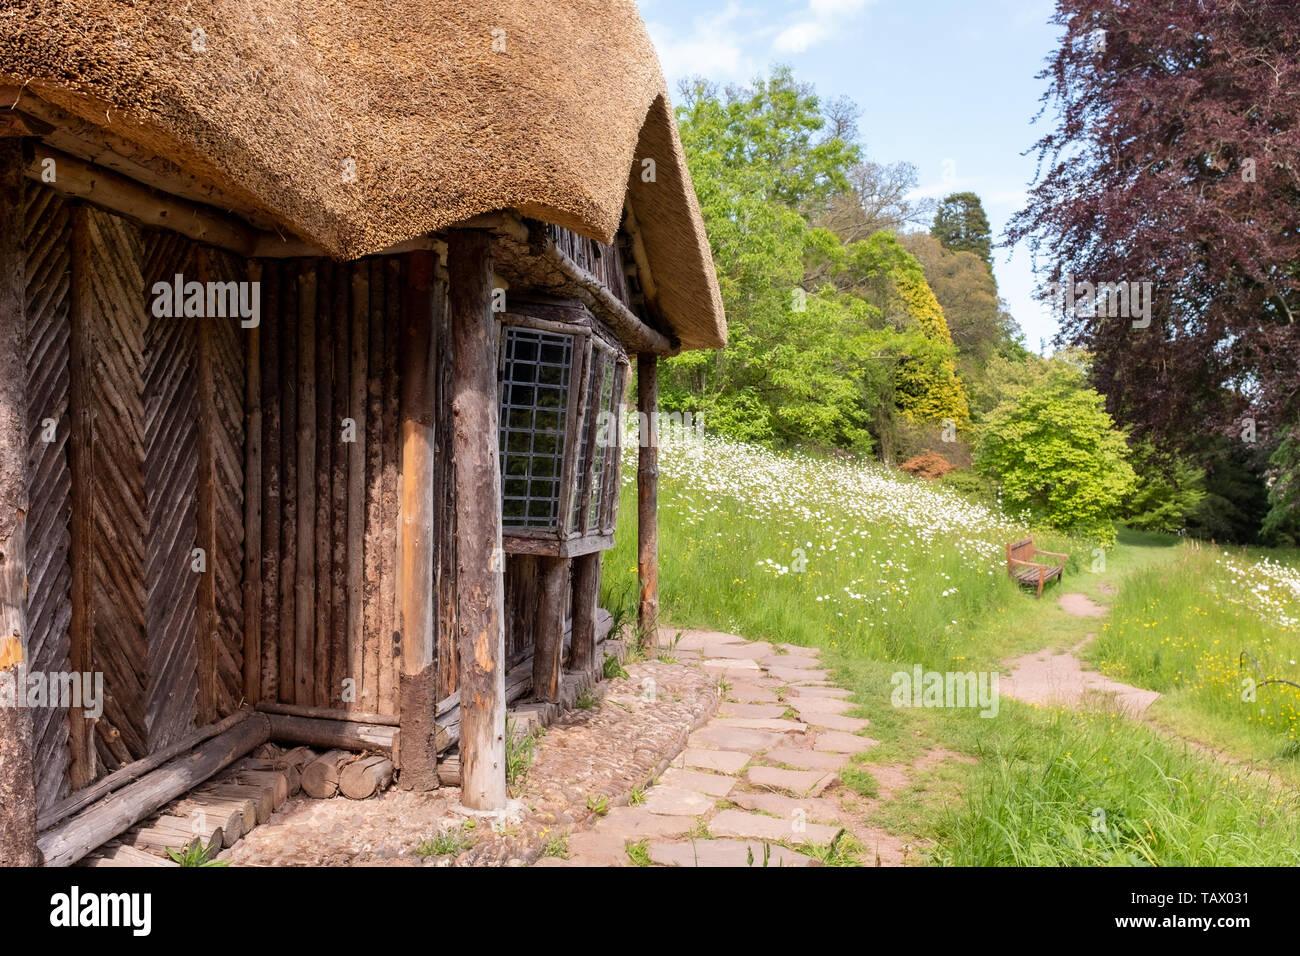 The Bear's Hut, old thatched garden building, Killerton Estate, National Trust, Devon, UK Stock Photo